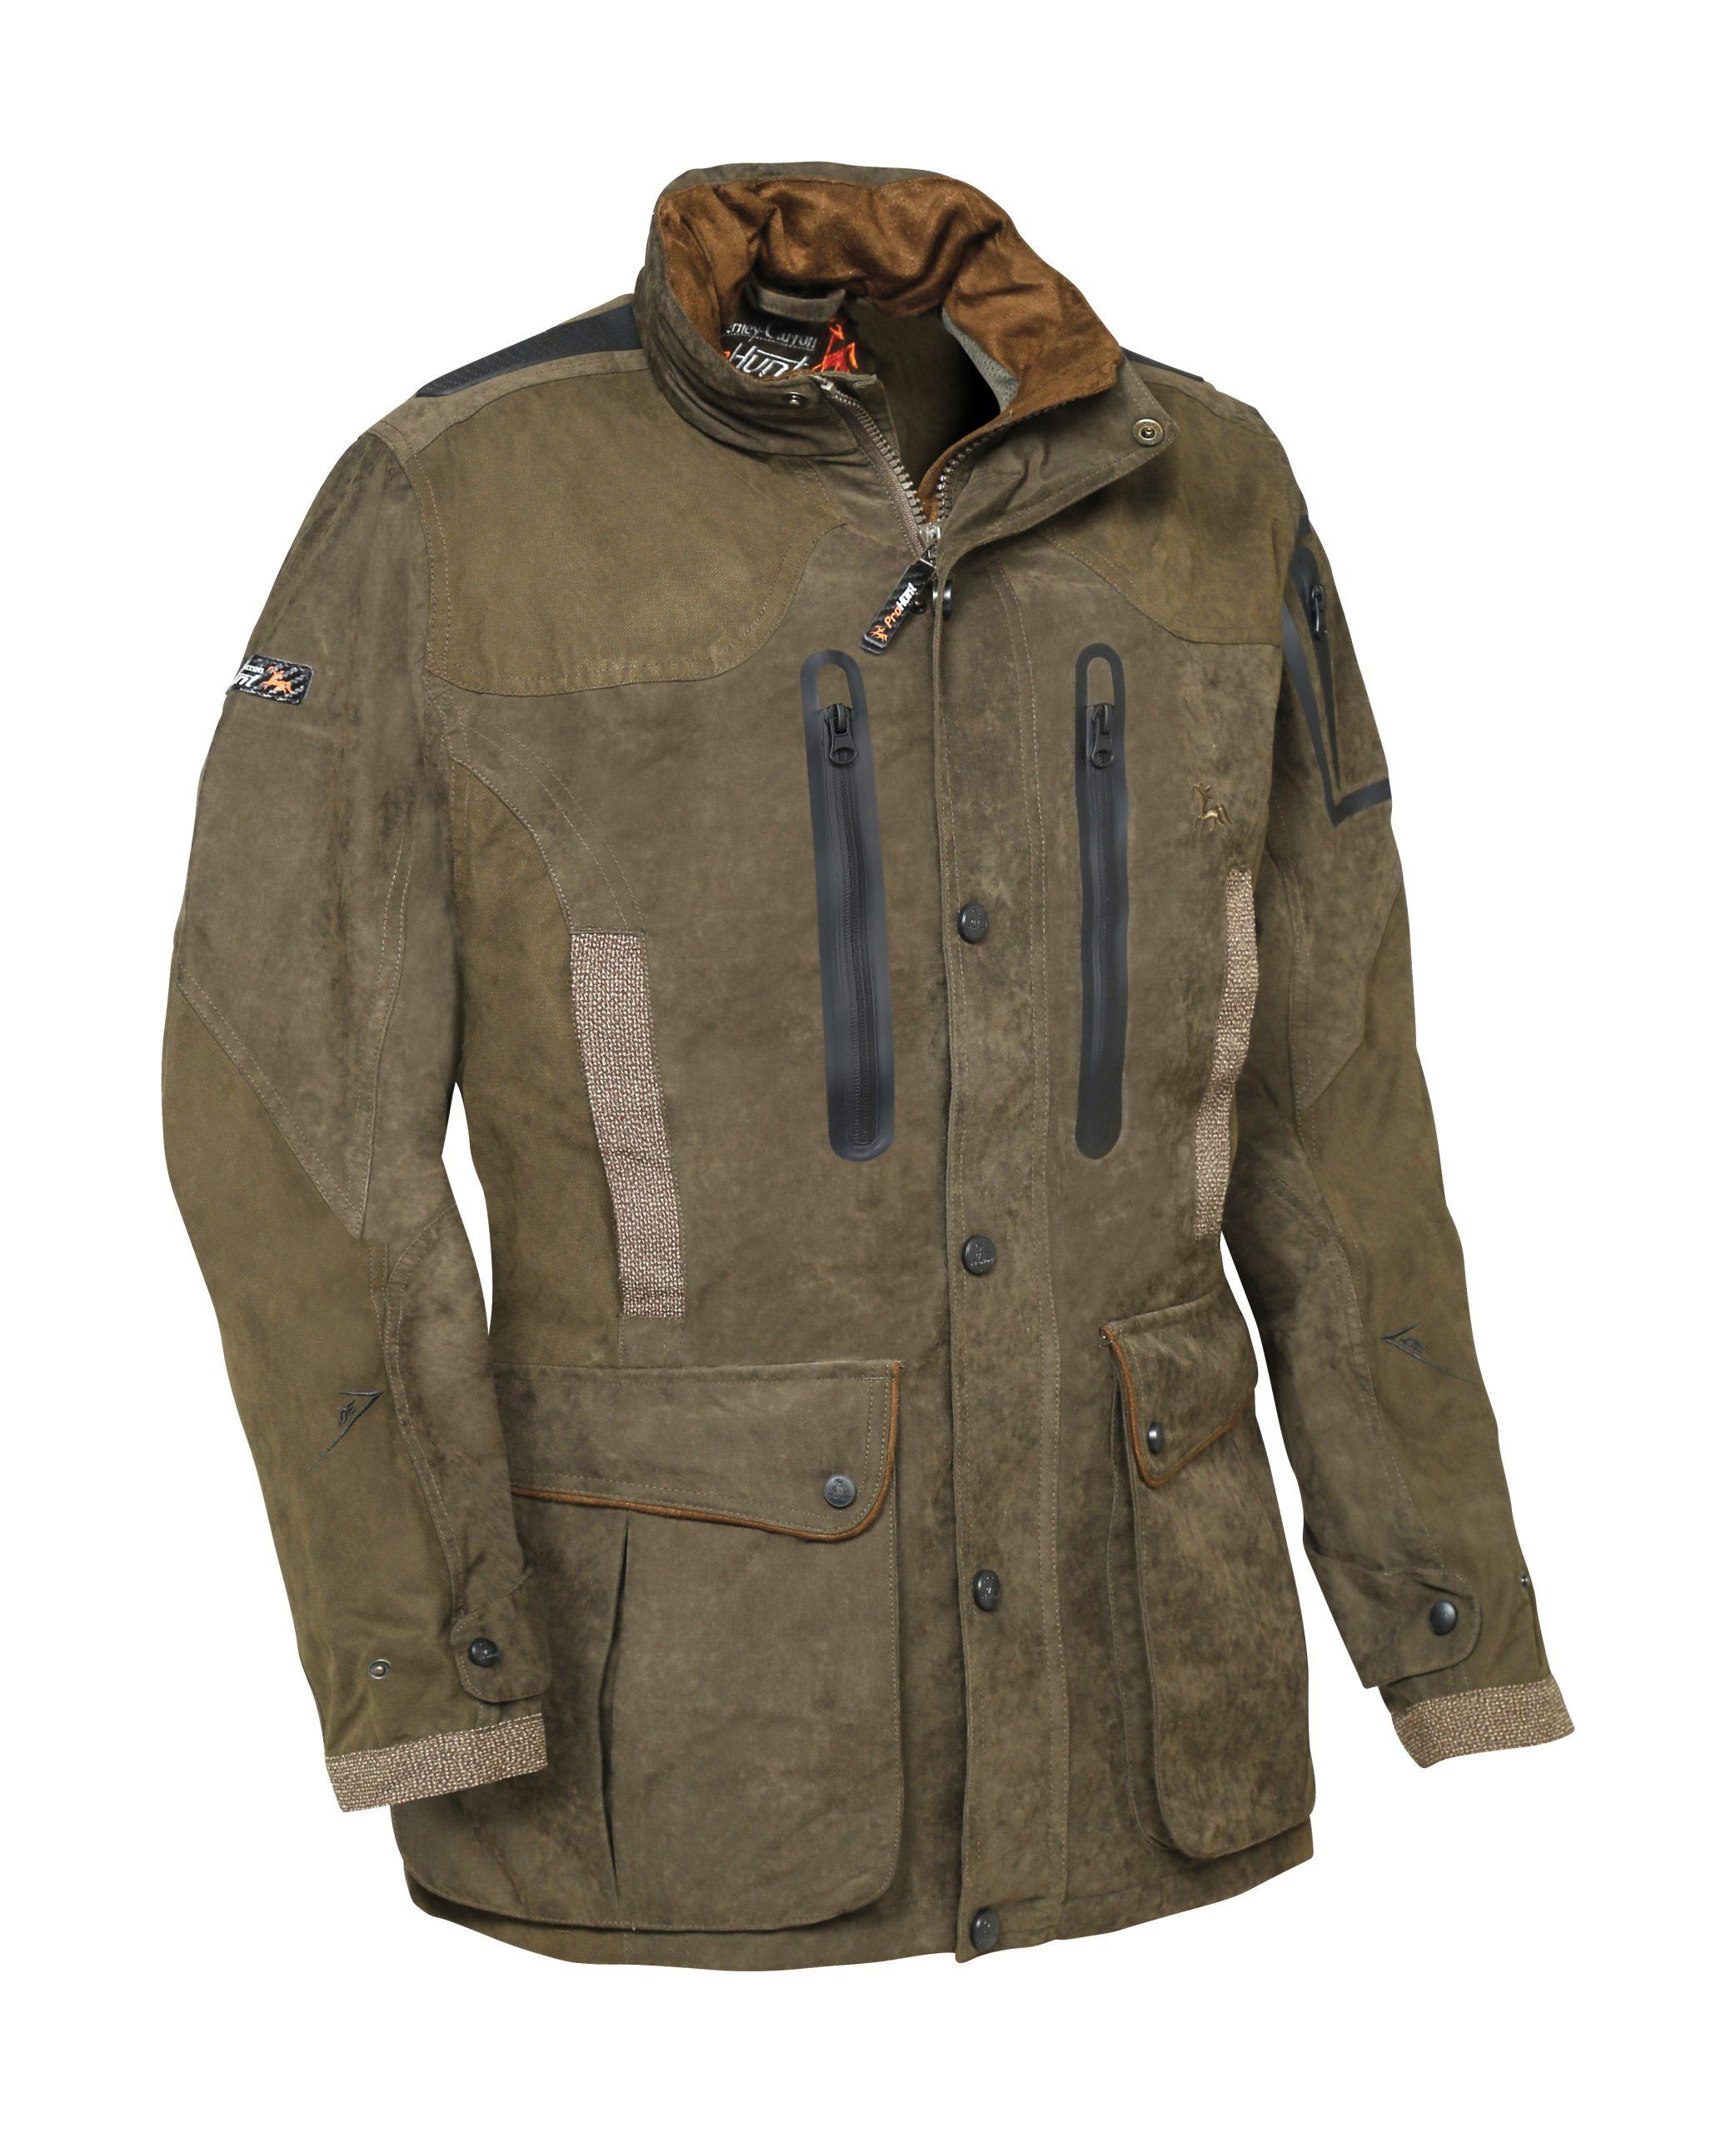 Verney-Carron Sika Jacket Khaki